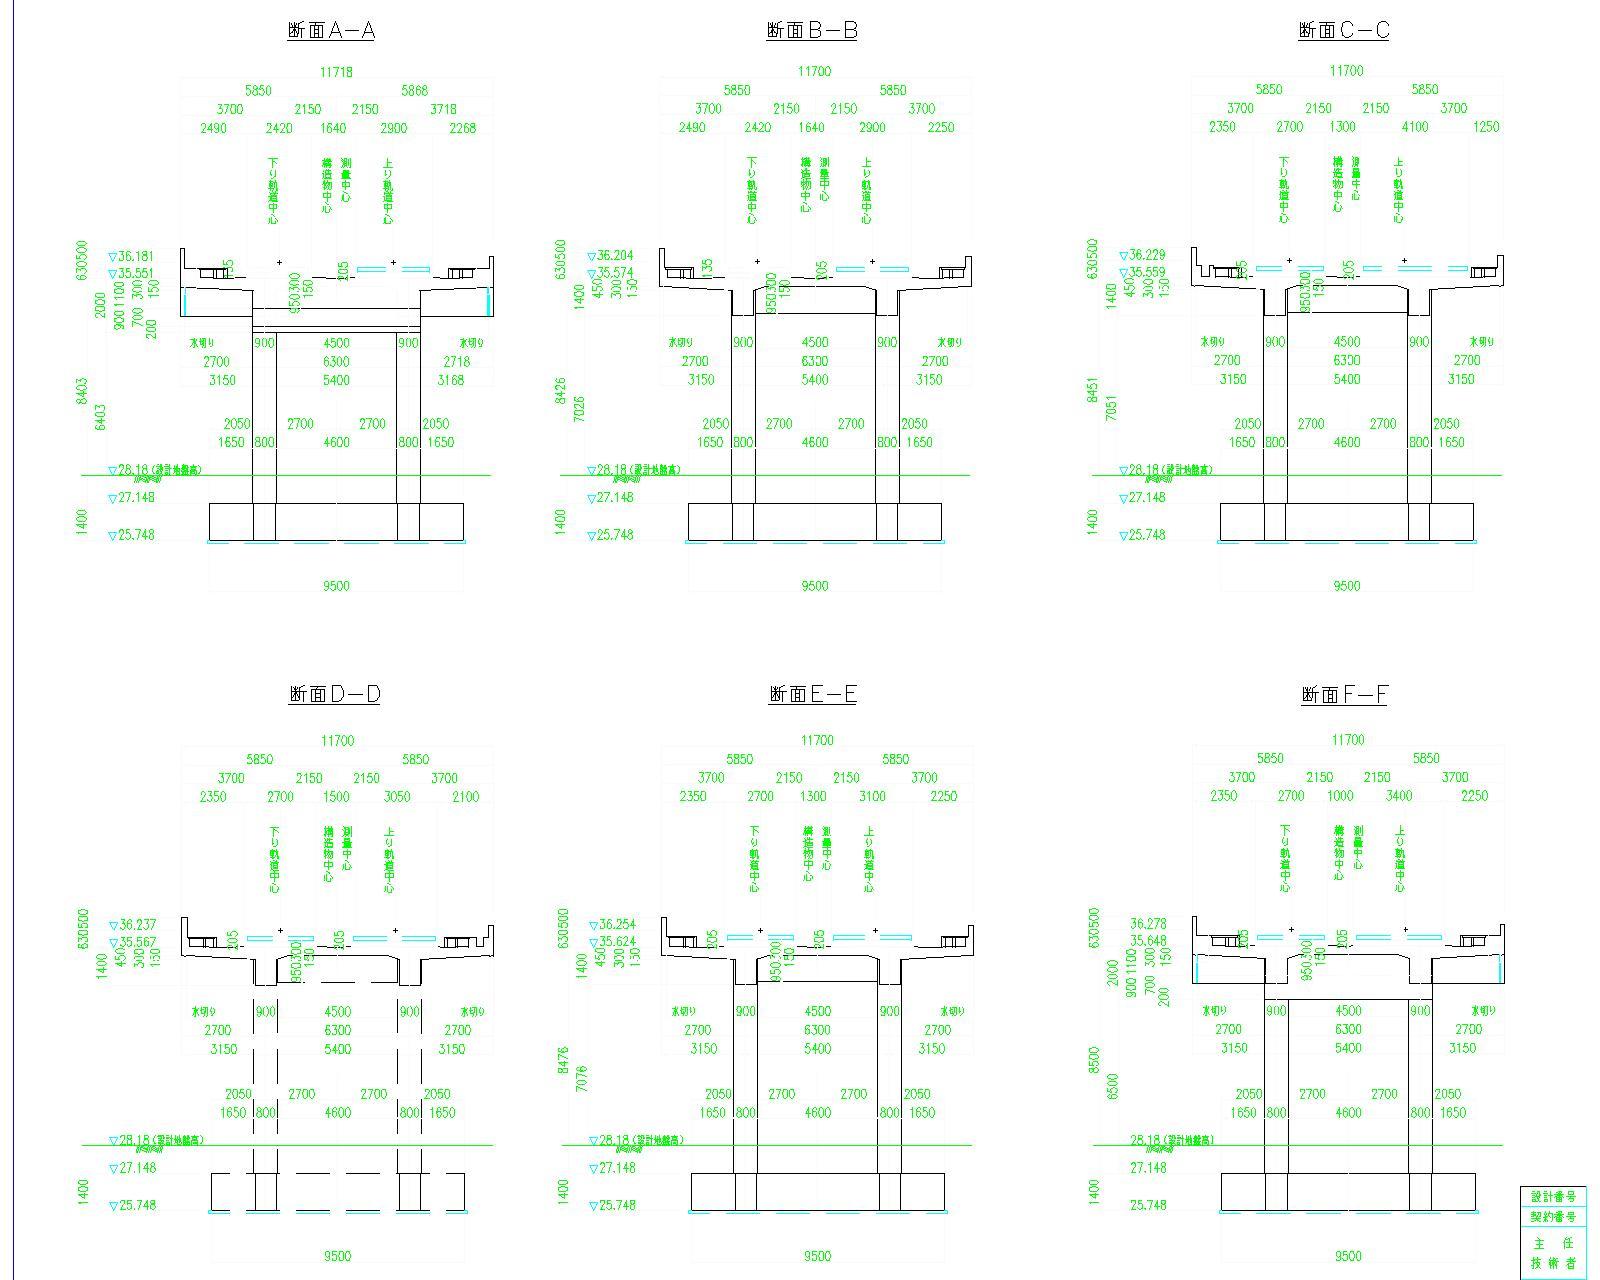 第3回設計変更 02 仮土留工計画図 断面図_recover-モデル